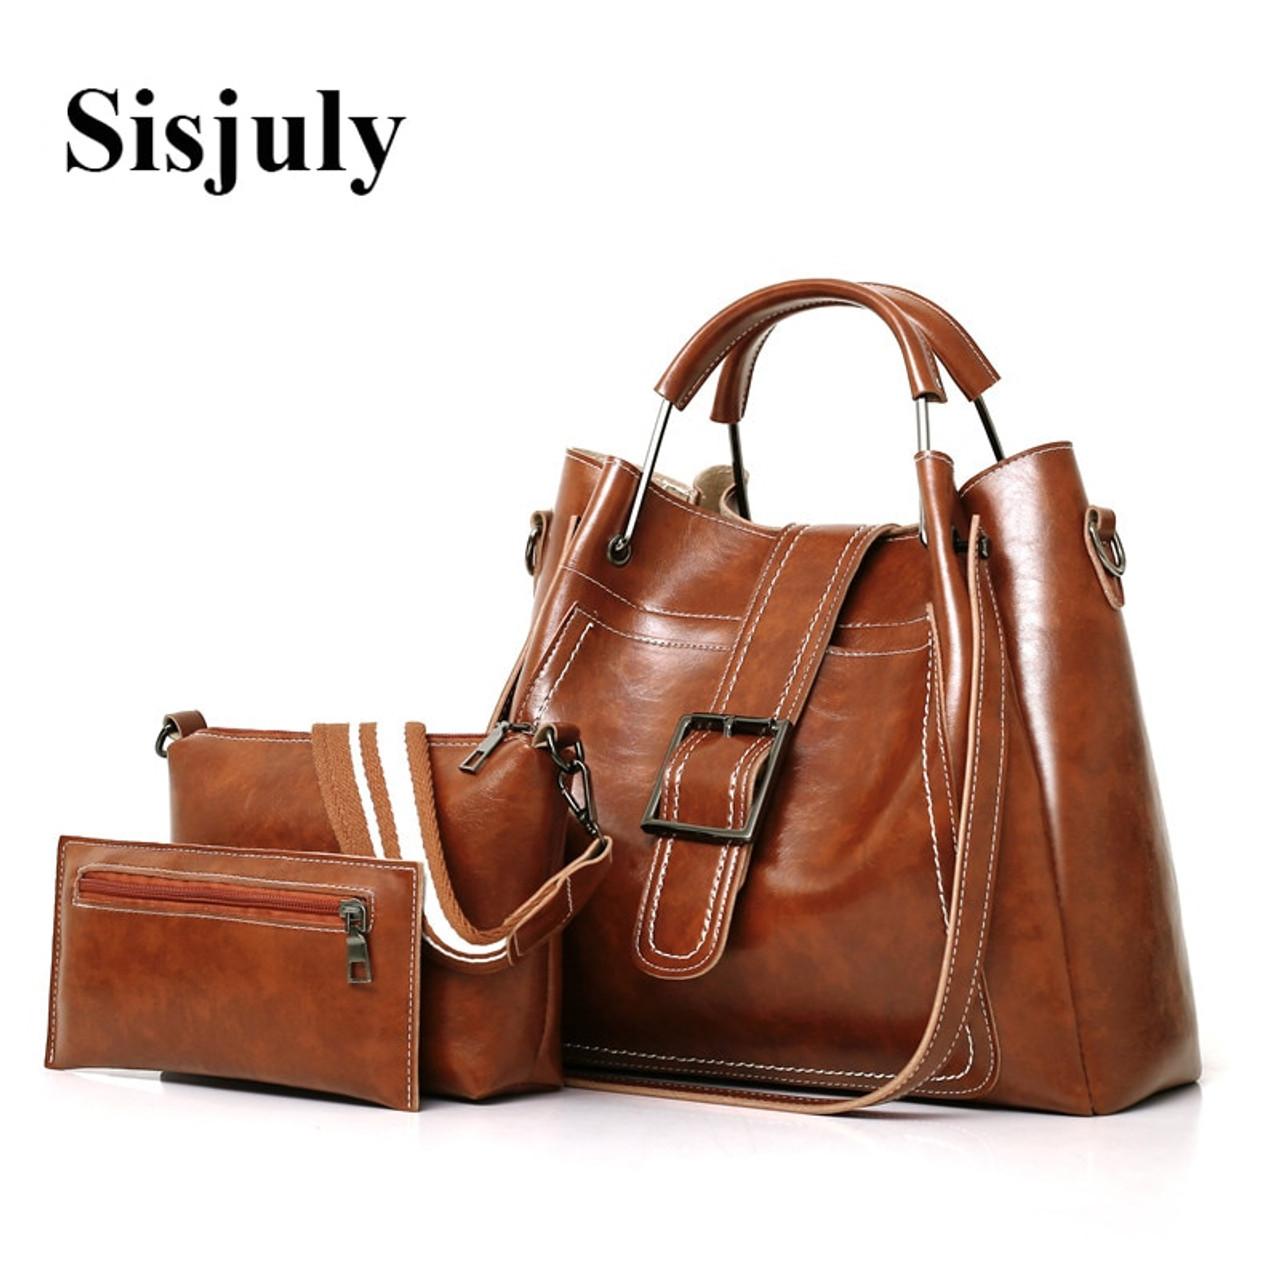 Sisjuly Women Bags Leather Luxury Handbags Famous Brands Female Shoulder  Bags Designer Crossbody Bags For Women s Messenger Bag - OnshopDeals.Com 406b4b3e6fd00